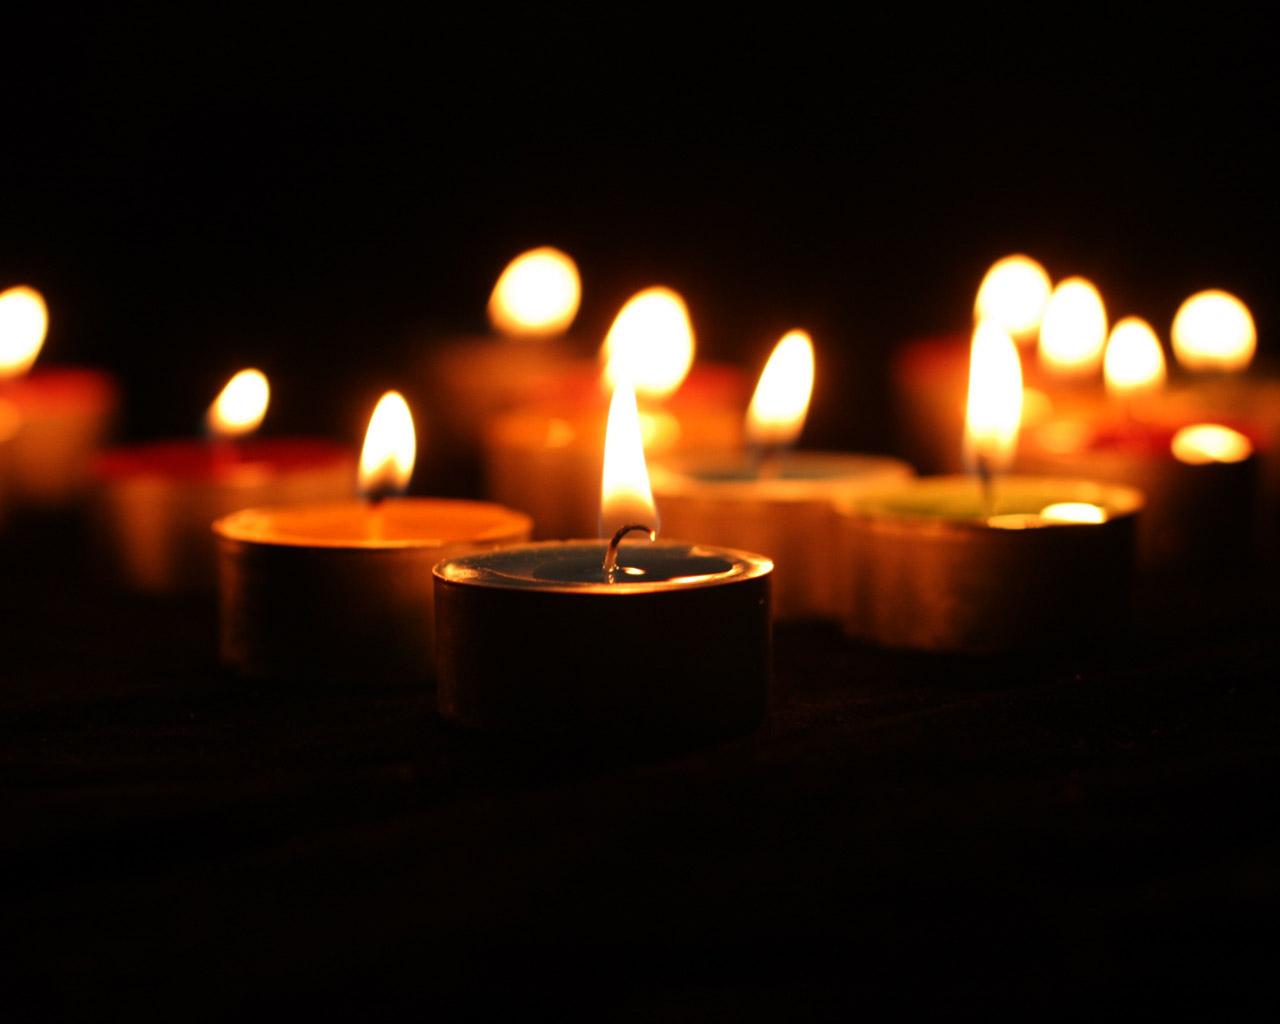 http://4.bp.blogspot.com/_eNG_XNKbhsk/S83ontWuQ2I/AAAAAAAAAIw/OpHyWKxNpiU/s1600/candle_wallpaper_candle_2020.jpg